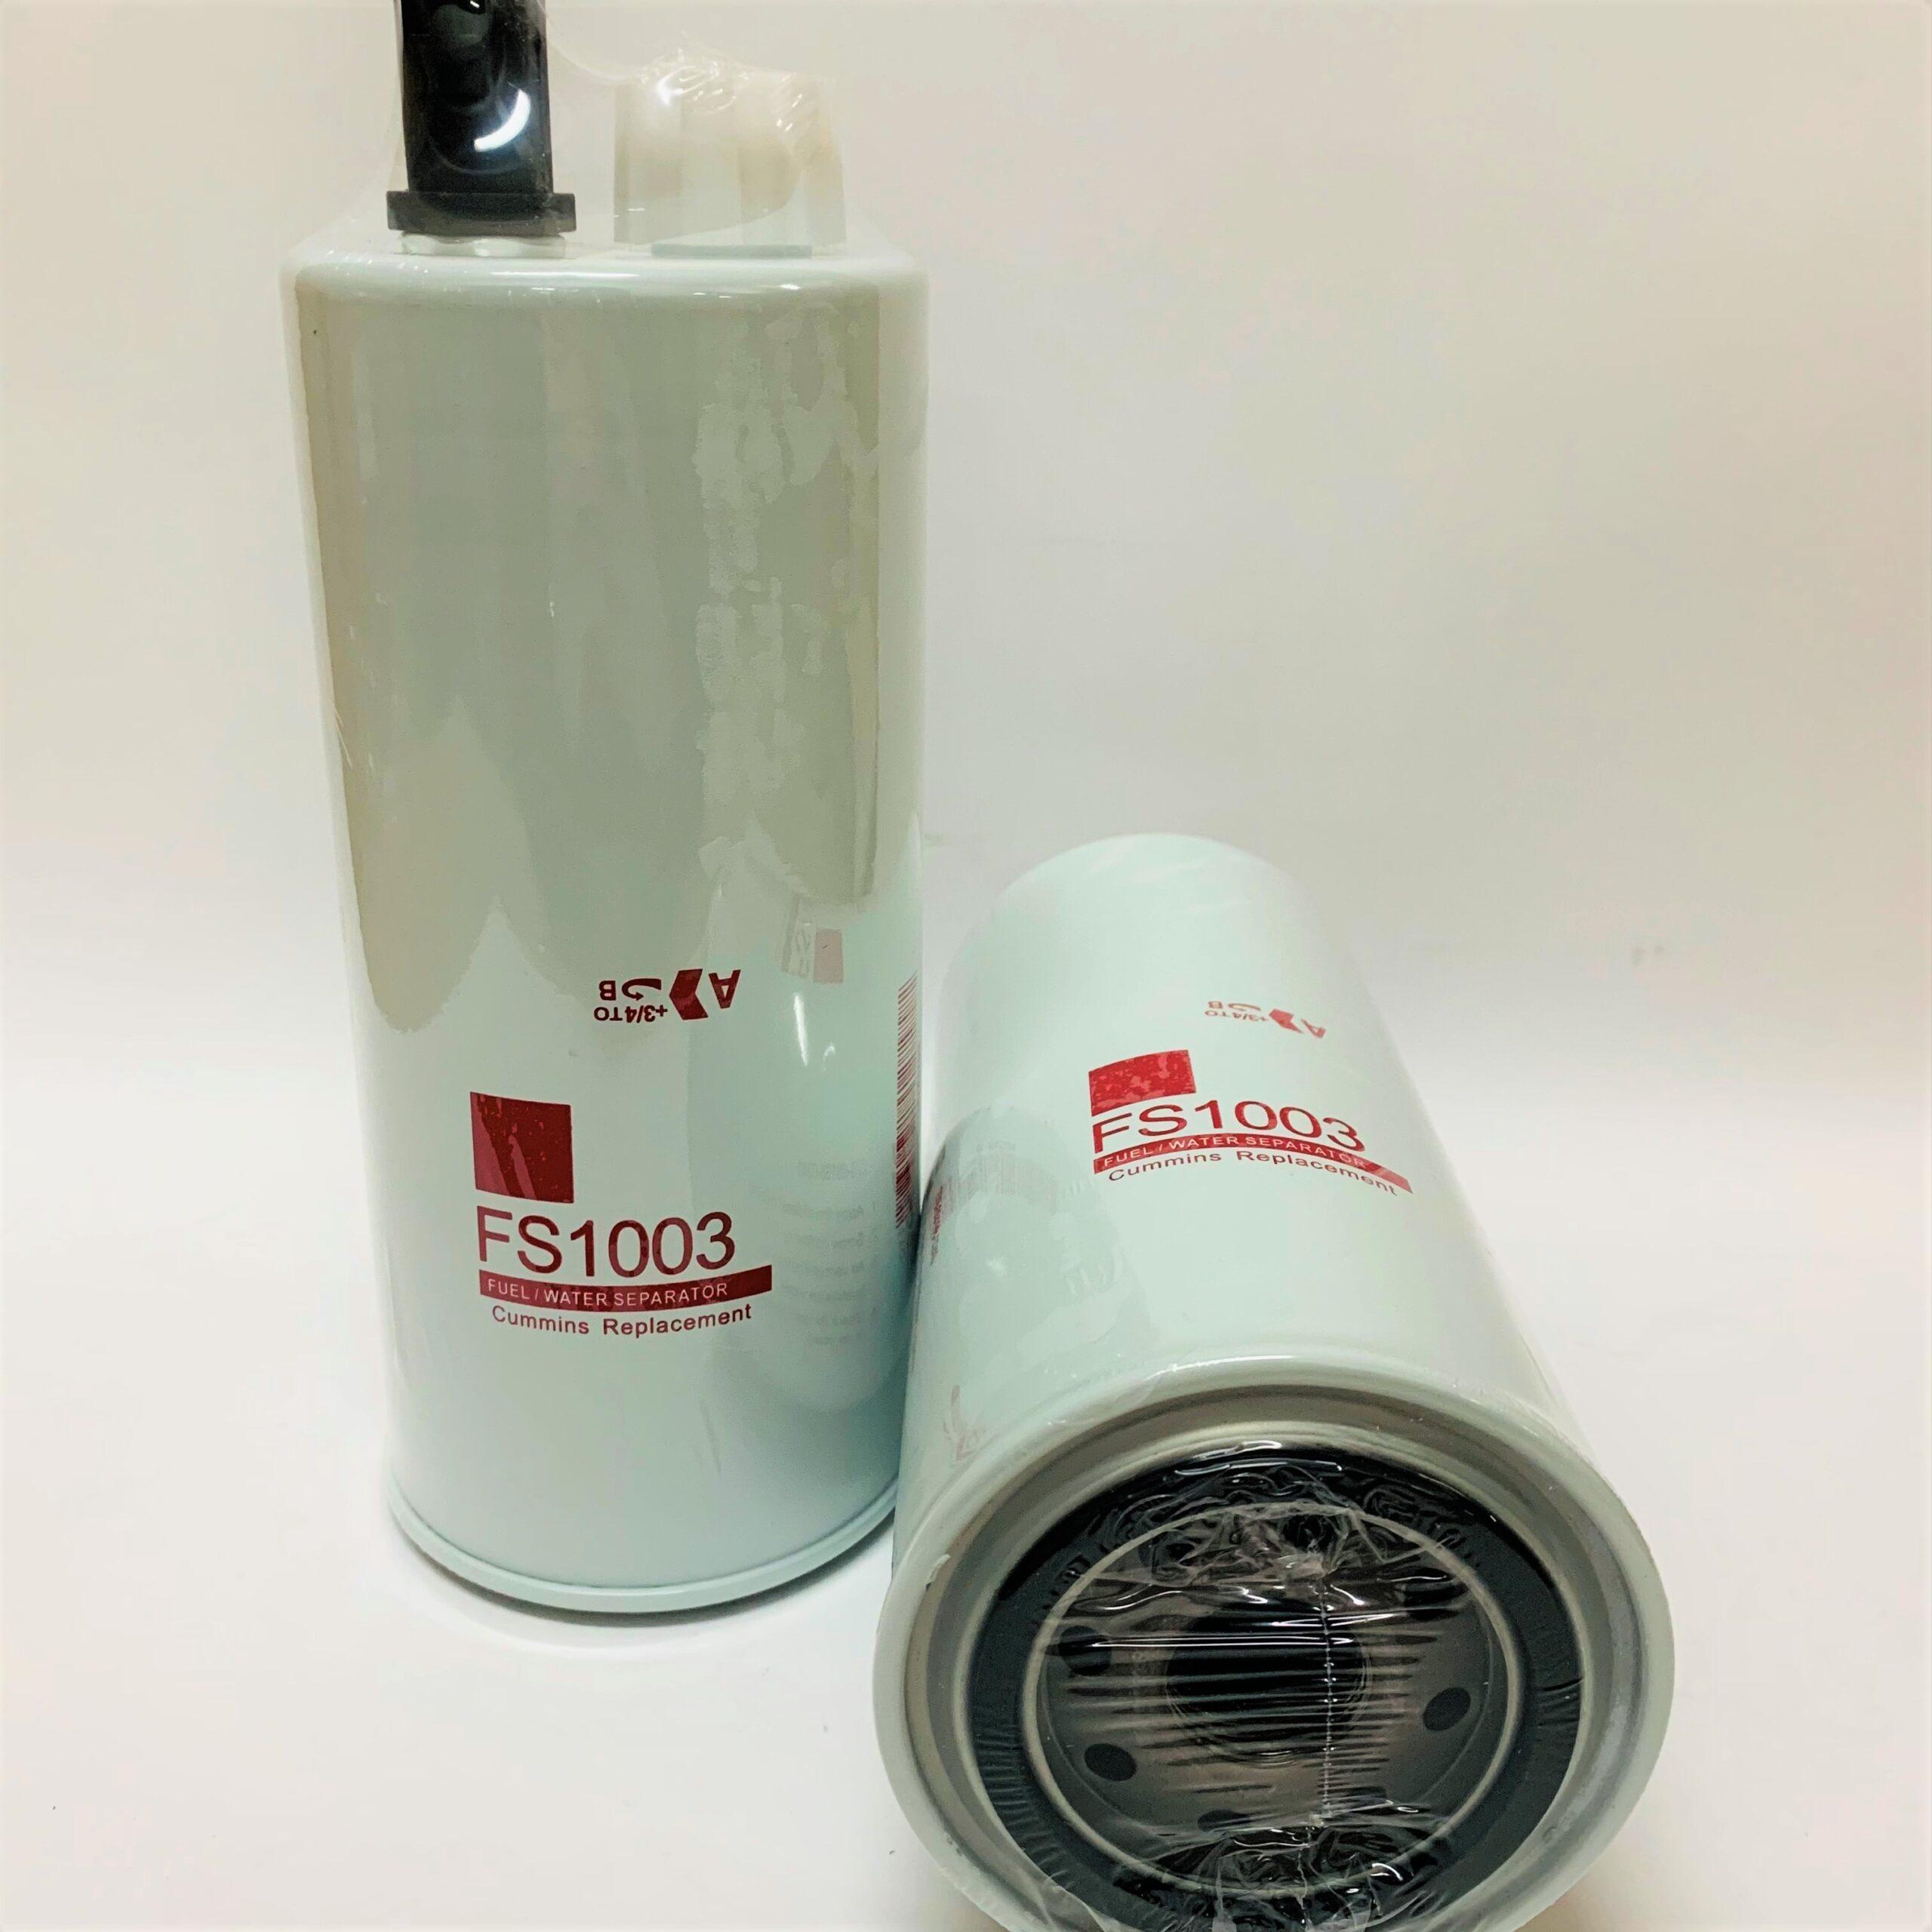 FS1003